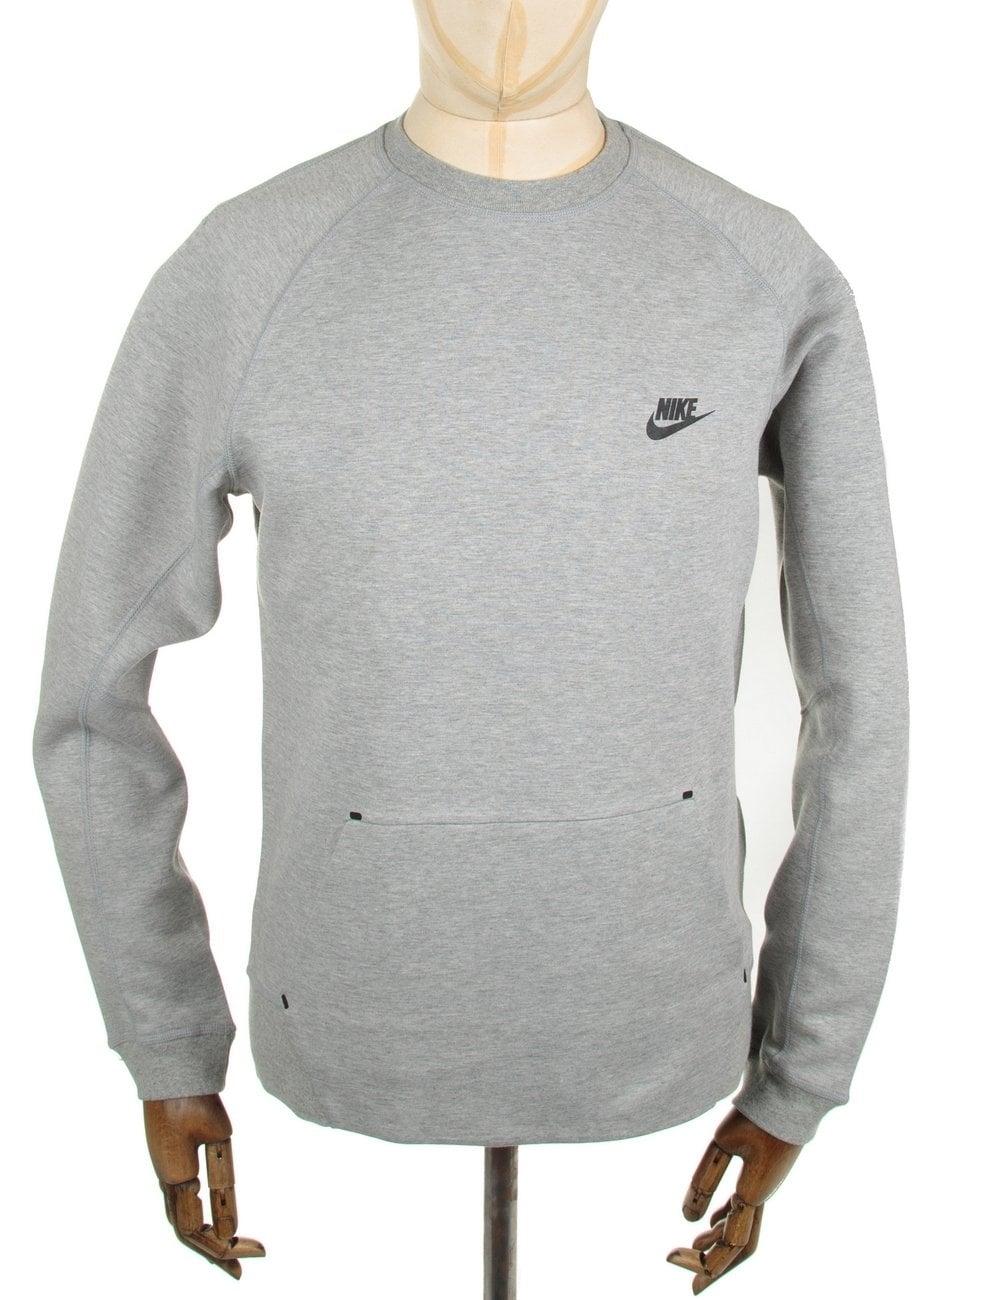 8f57bf78 Nike Tech Fleece Crewneck Sweat - Grey - Sweats from Fat Buddha Store UK